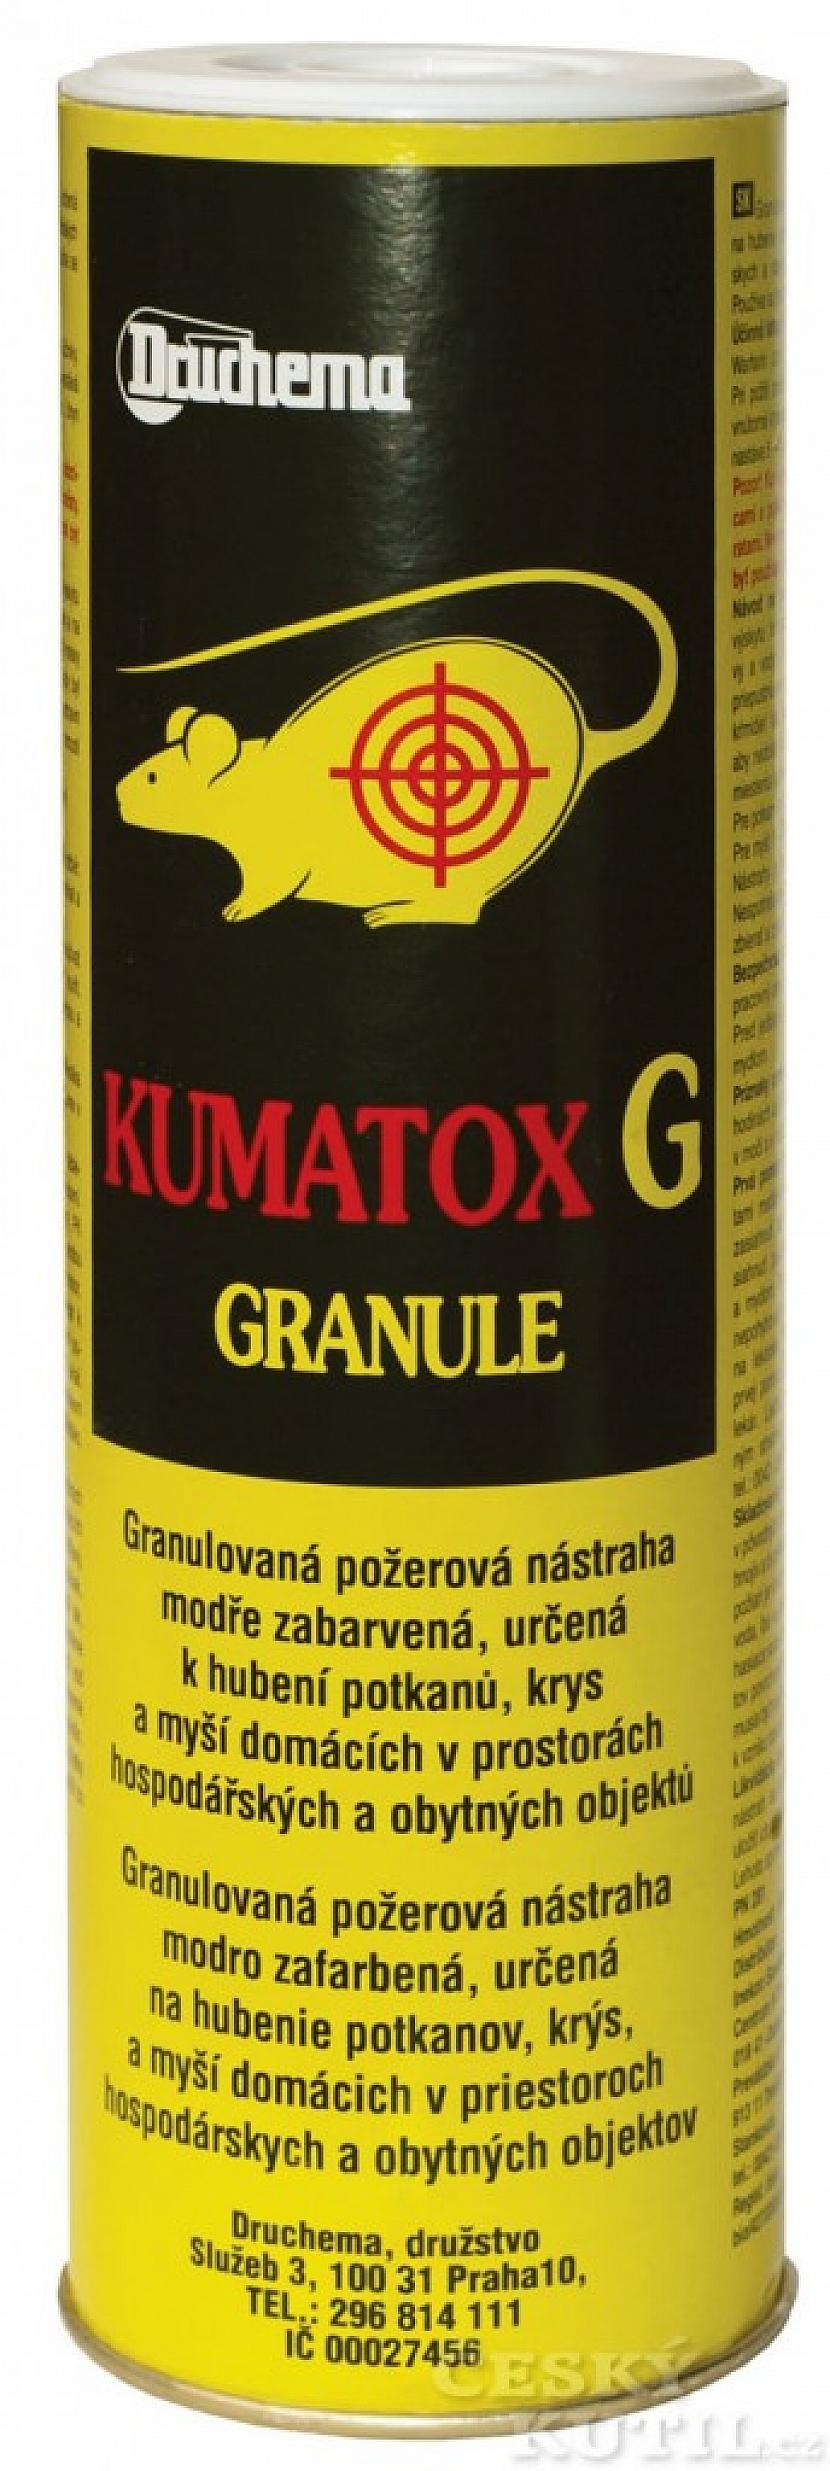 Jak na deratizaci? KUMATOX G